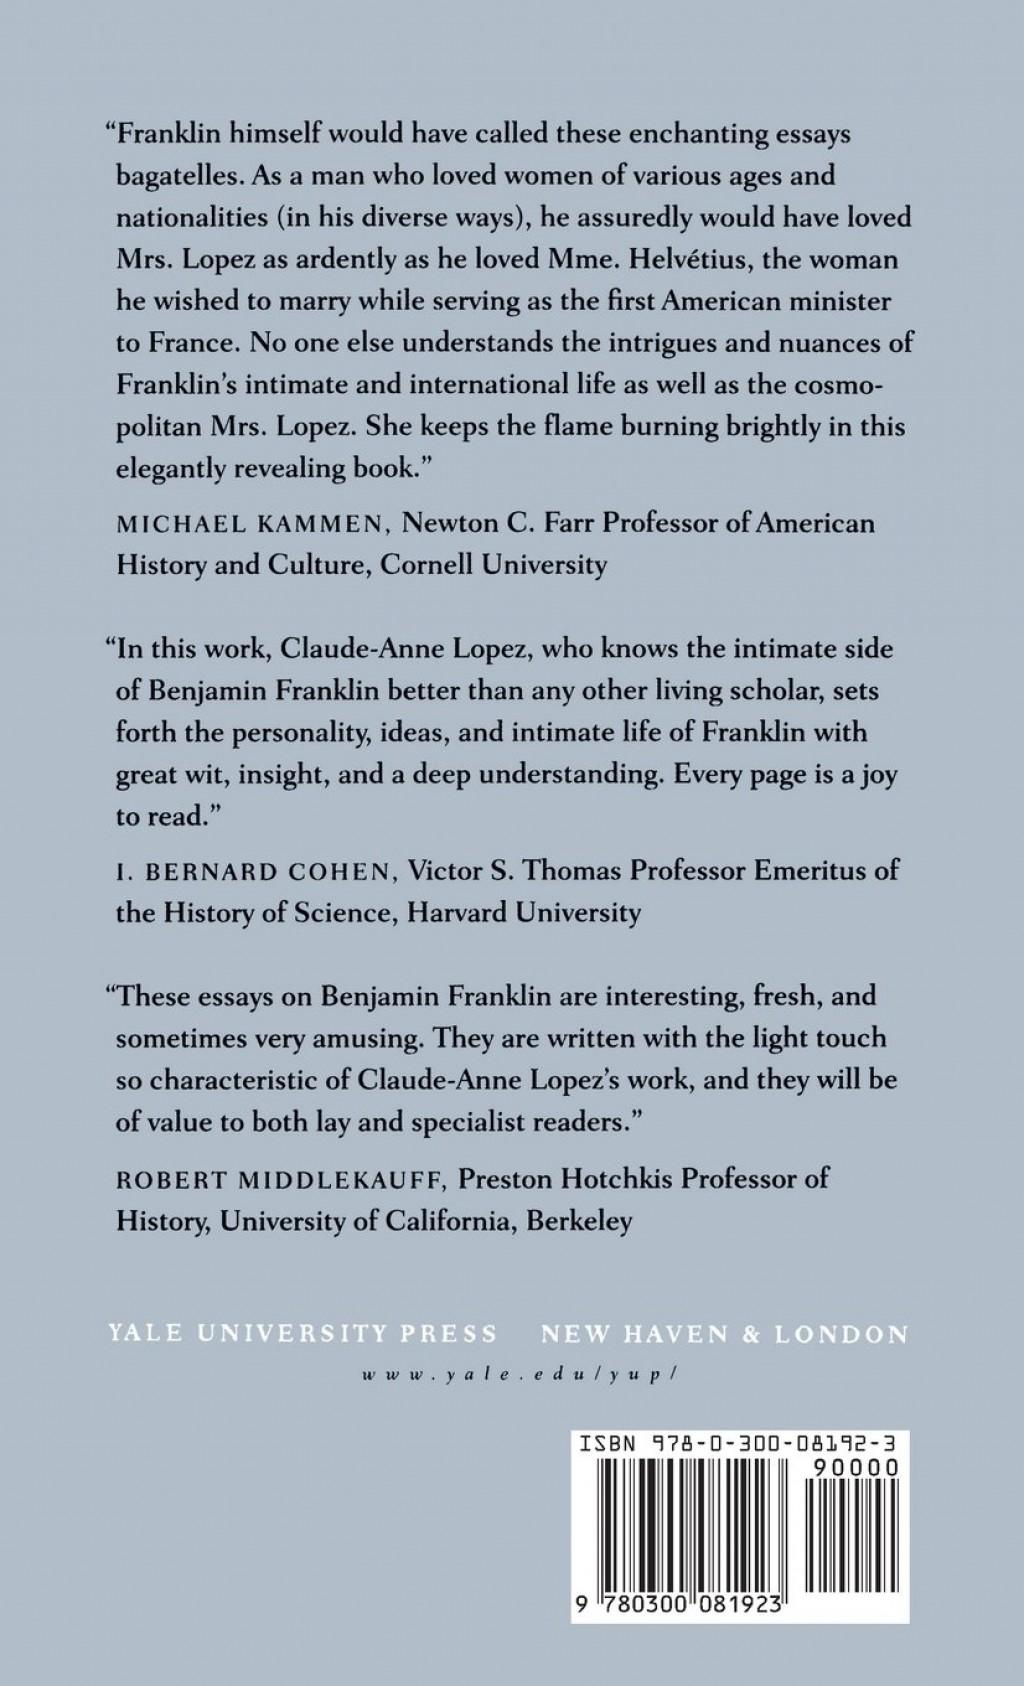 008 71domzzg7cl Benjamin Franklin Essay Unbelievable Thesis Statement Conclusion Large